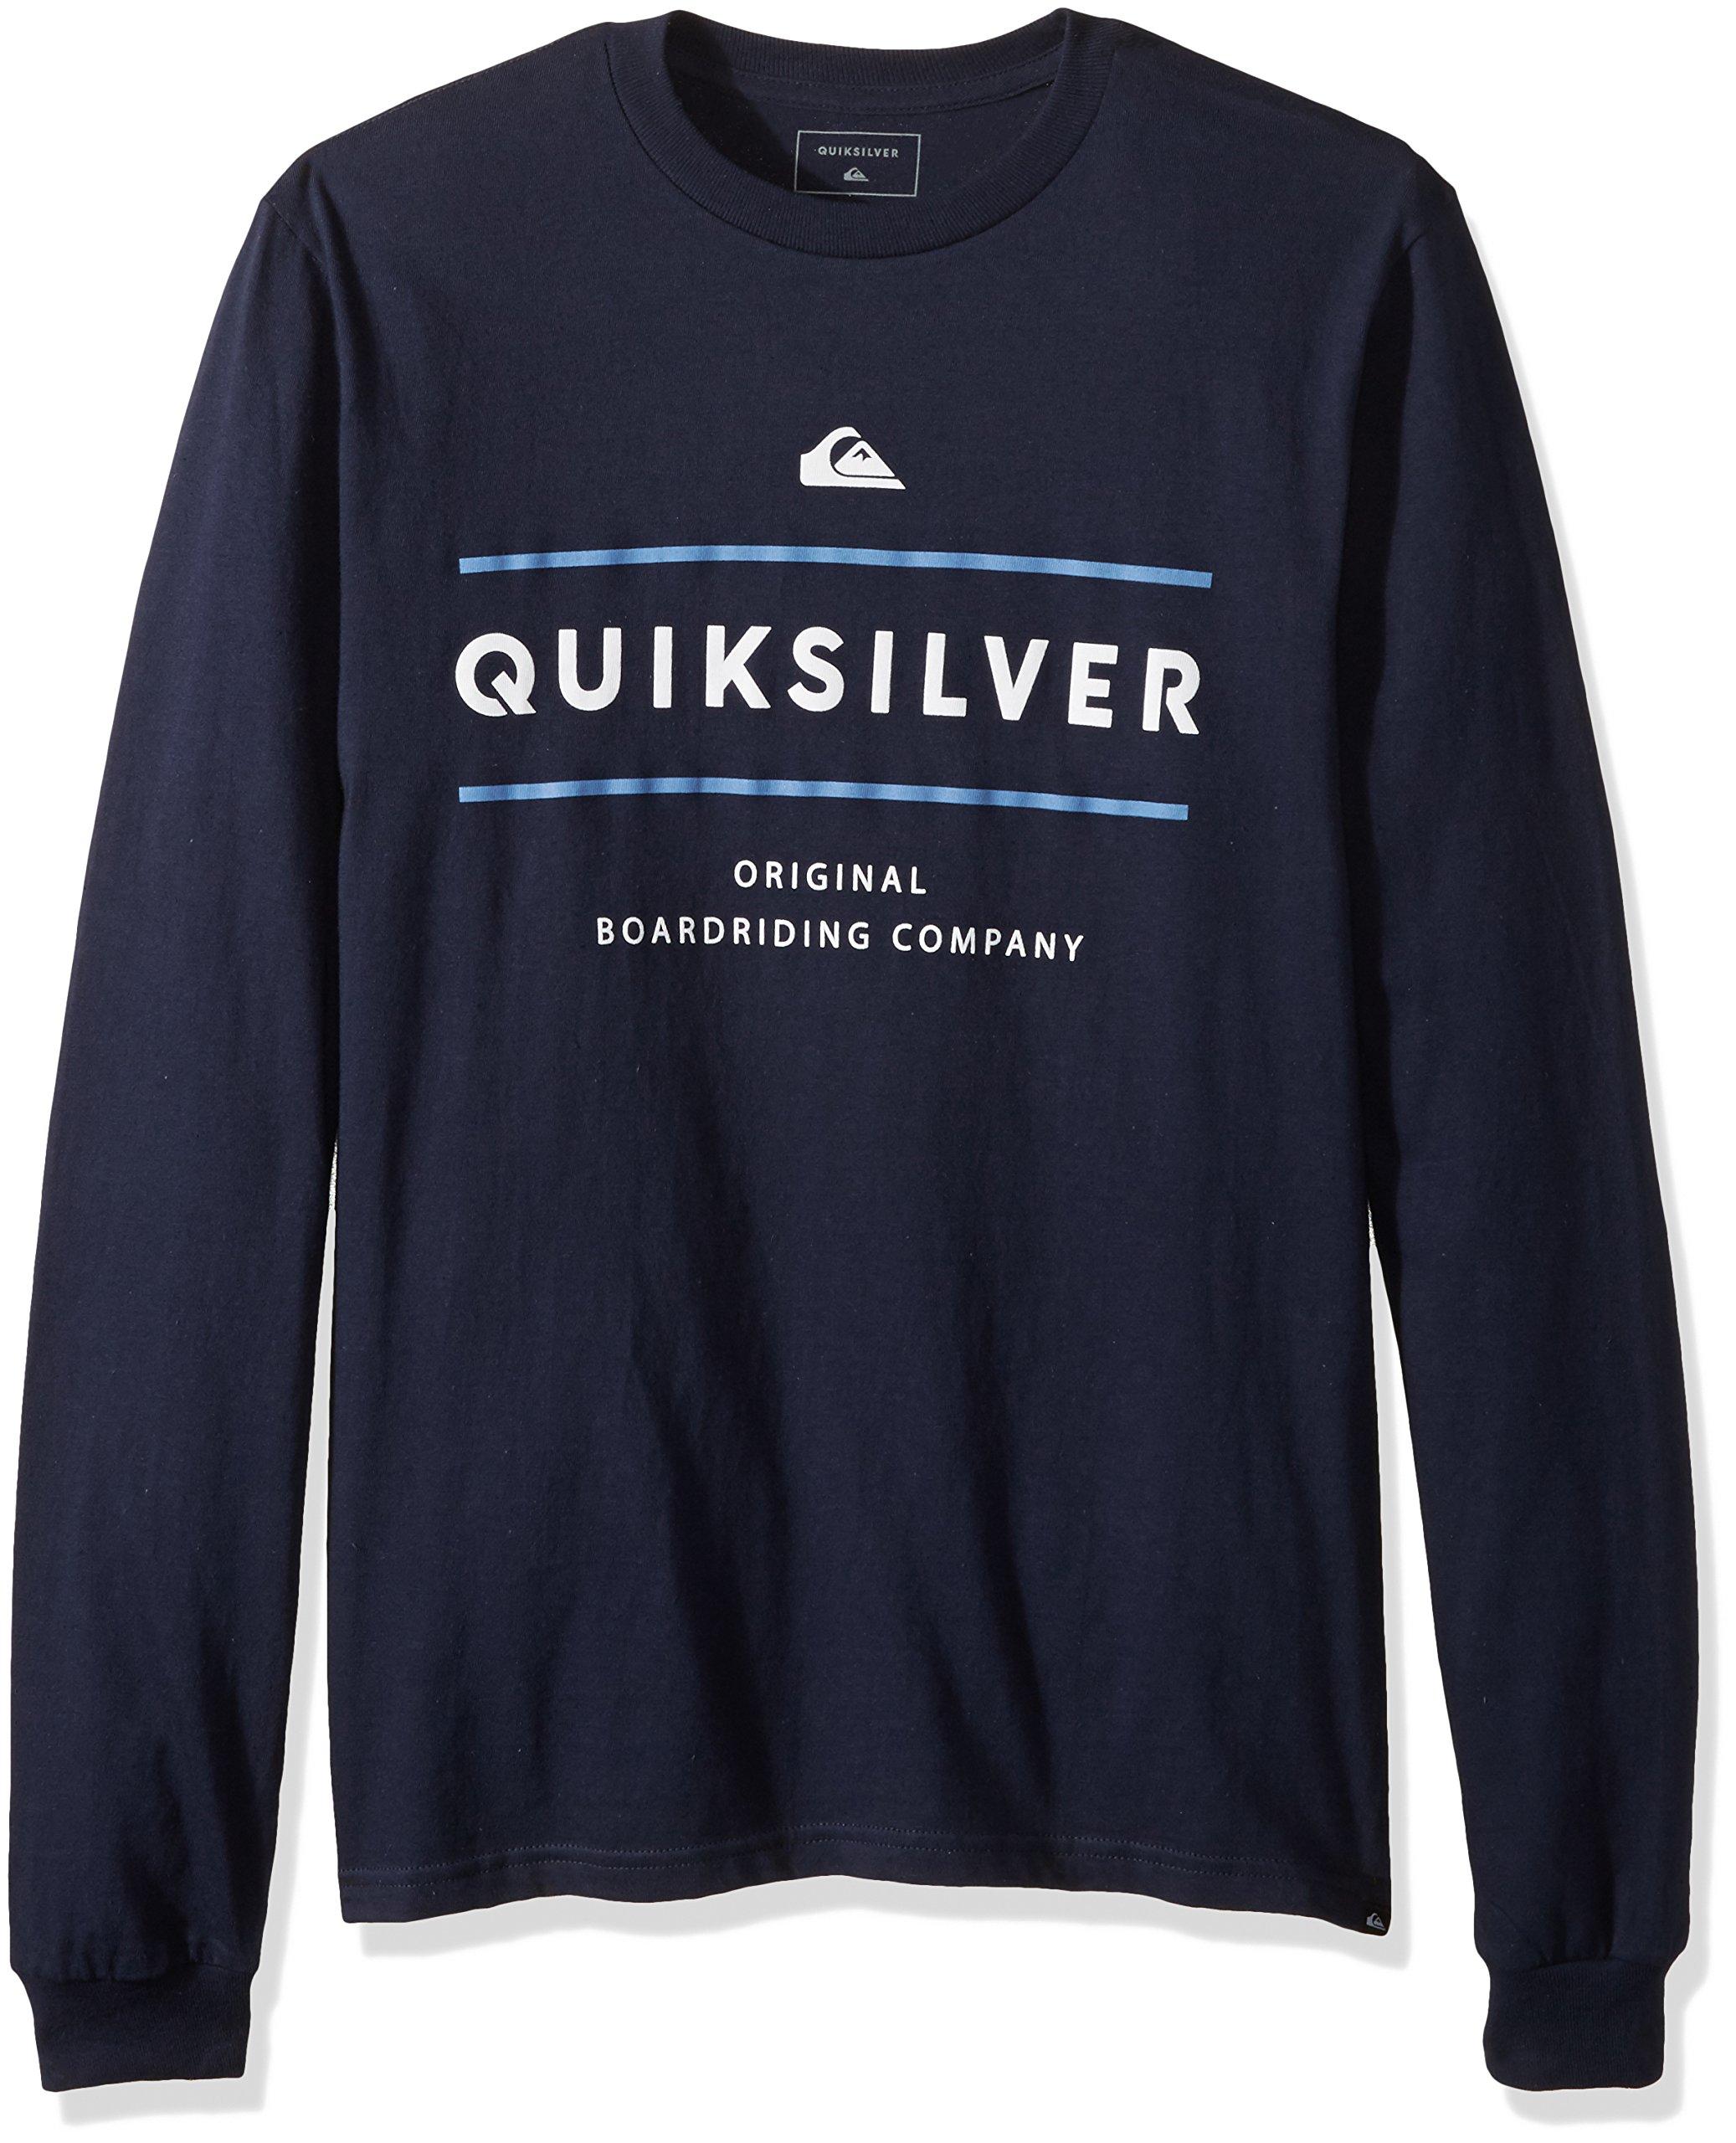 Quiksilver Men's Reverso Surfo Tee, Navy Blazer, M